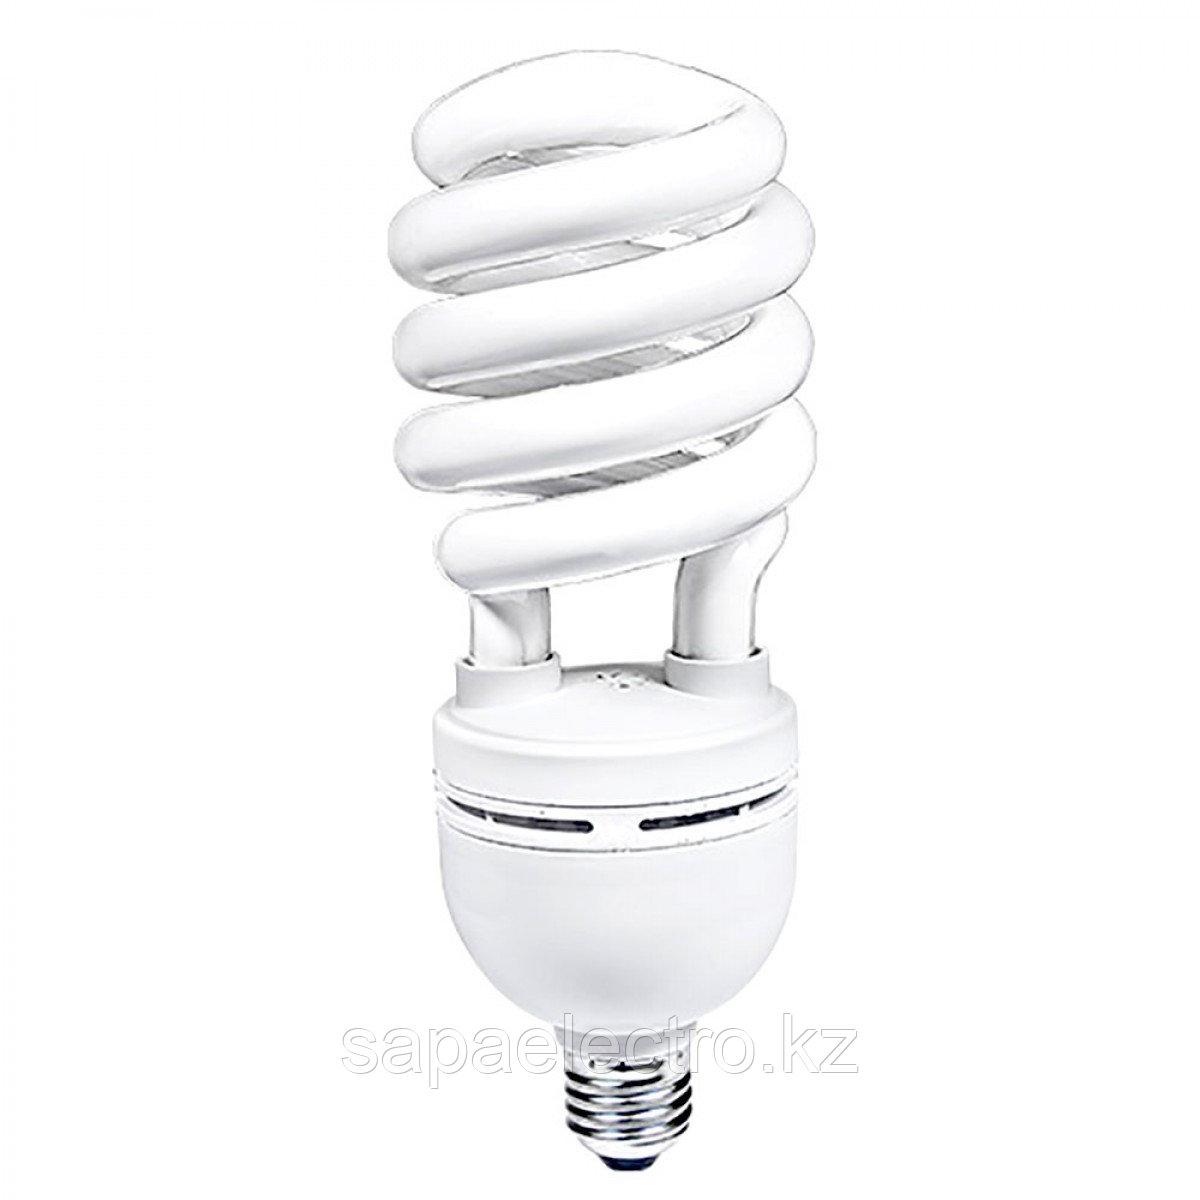 Лампа SPIRAL  42W  E27  860 (TECHNOLIGHT) 25шт